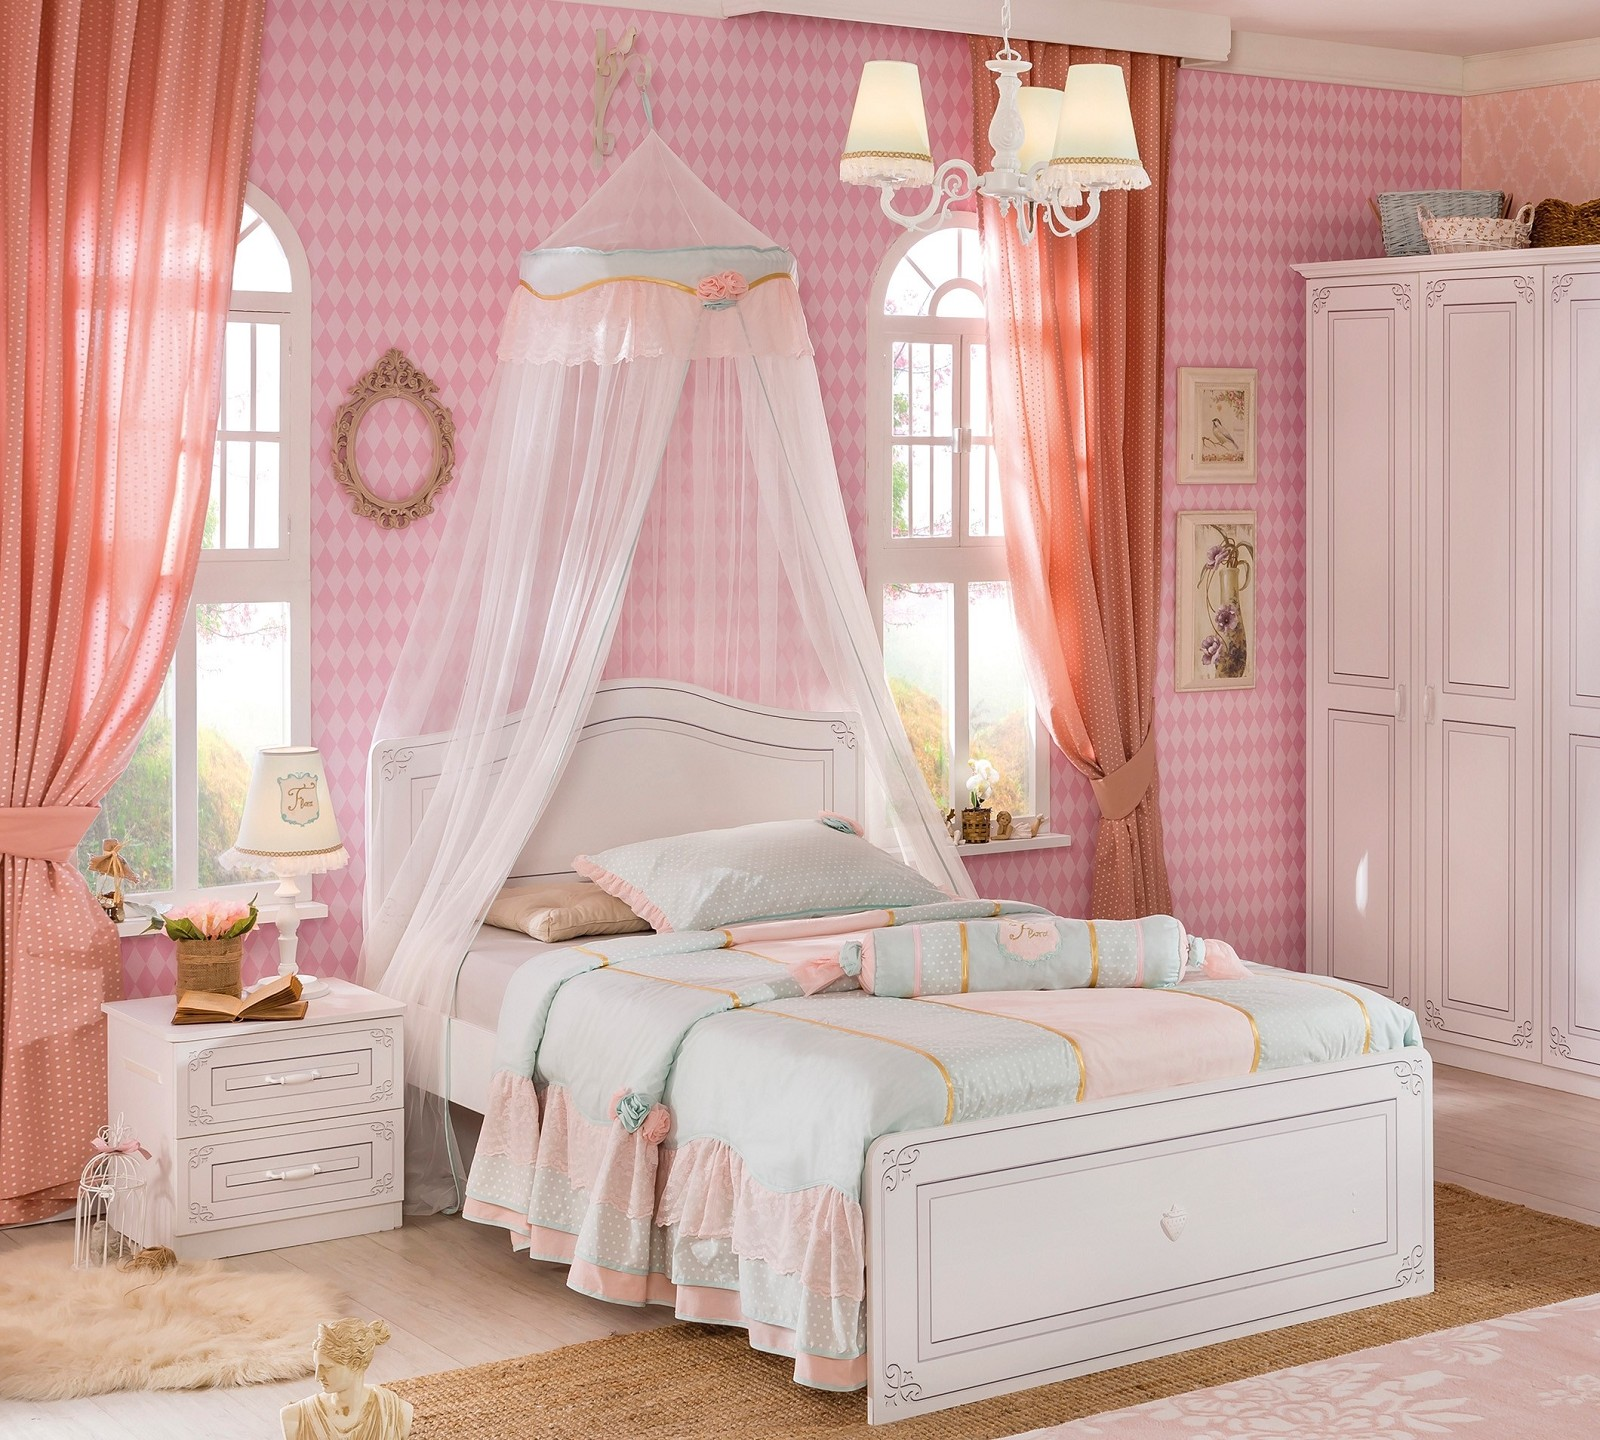 Full Size of Kinderbett Mädchen Fr Mdchen Selena 120x200 Kindermbel Mit Betten Bett Wohnzimmer Kinderbett Mädchen